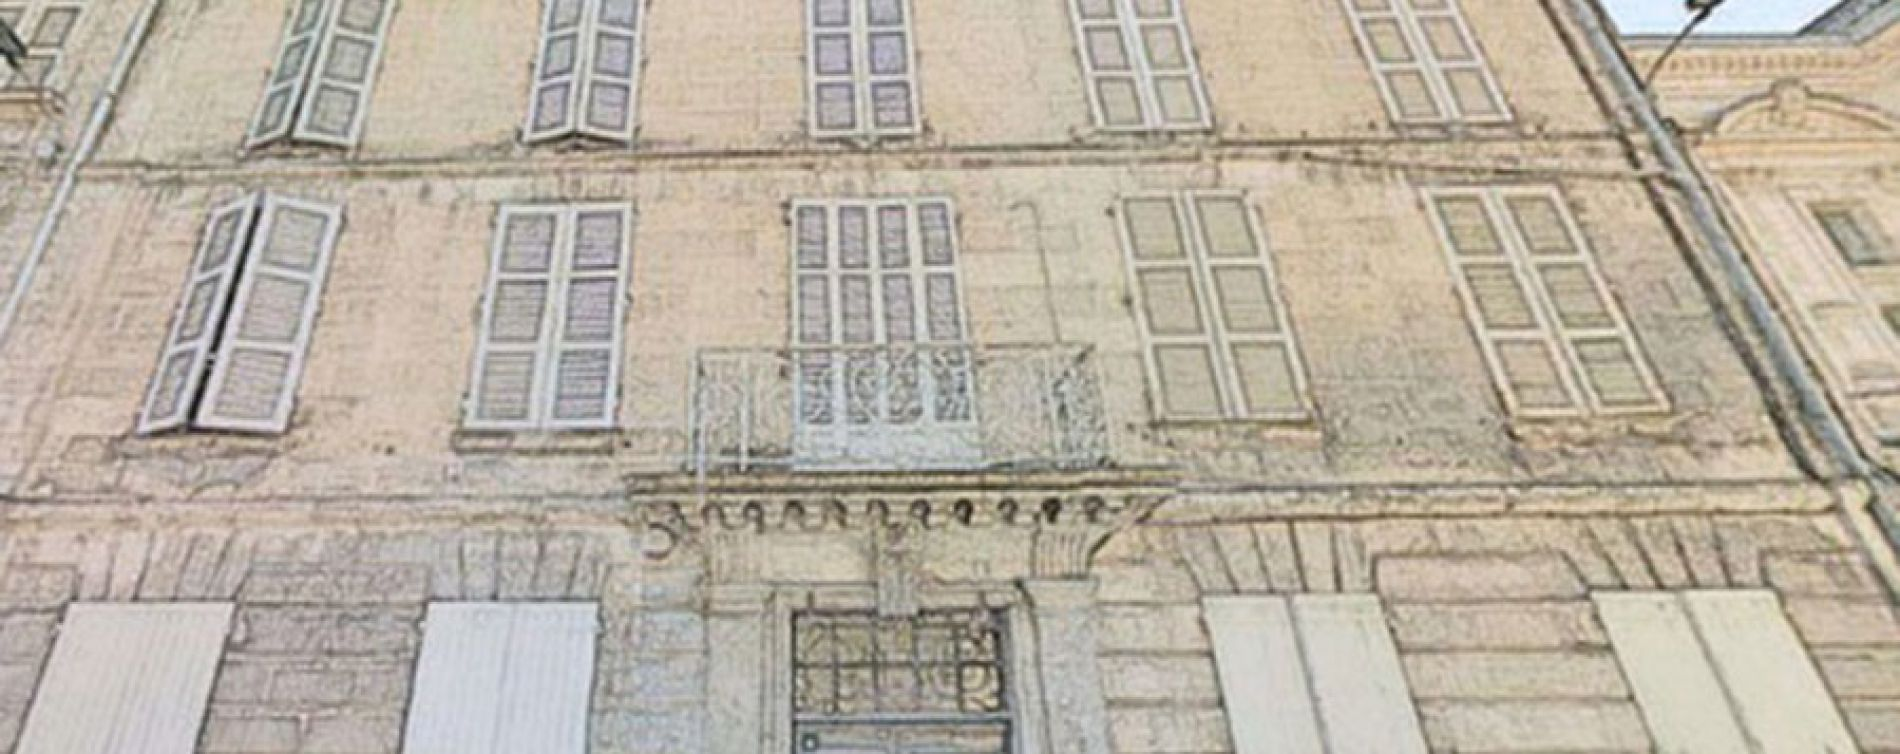 Résidence Résidence du Théâtre à Angoulême